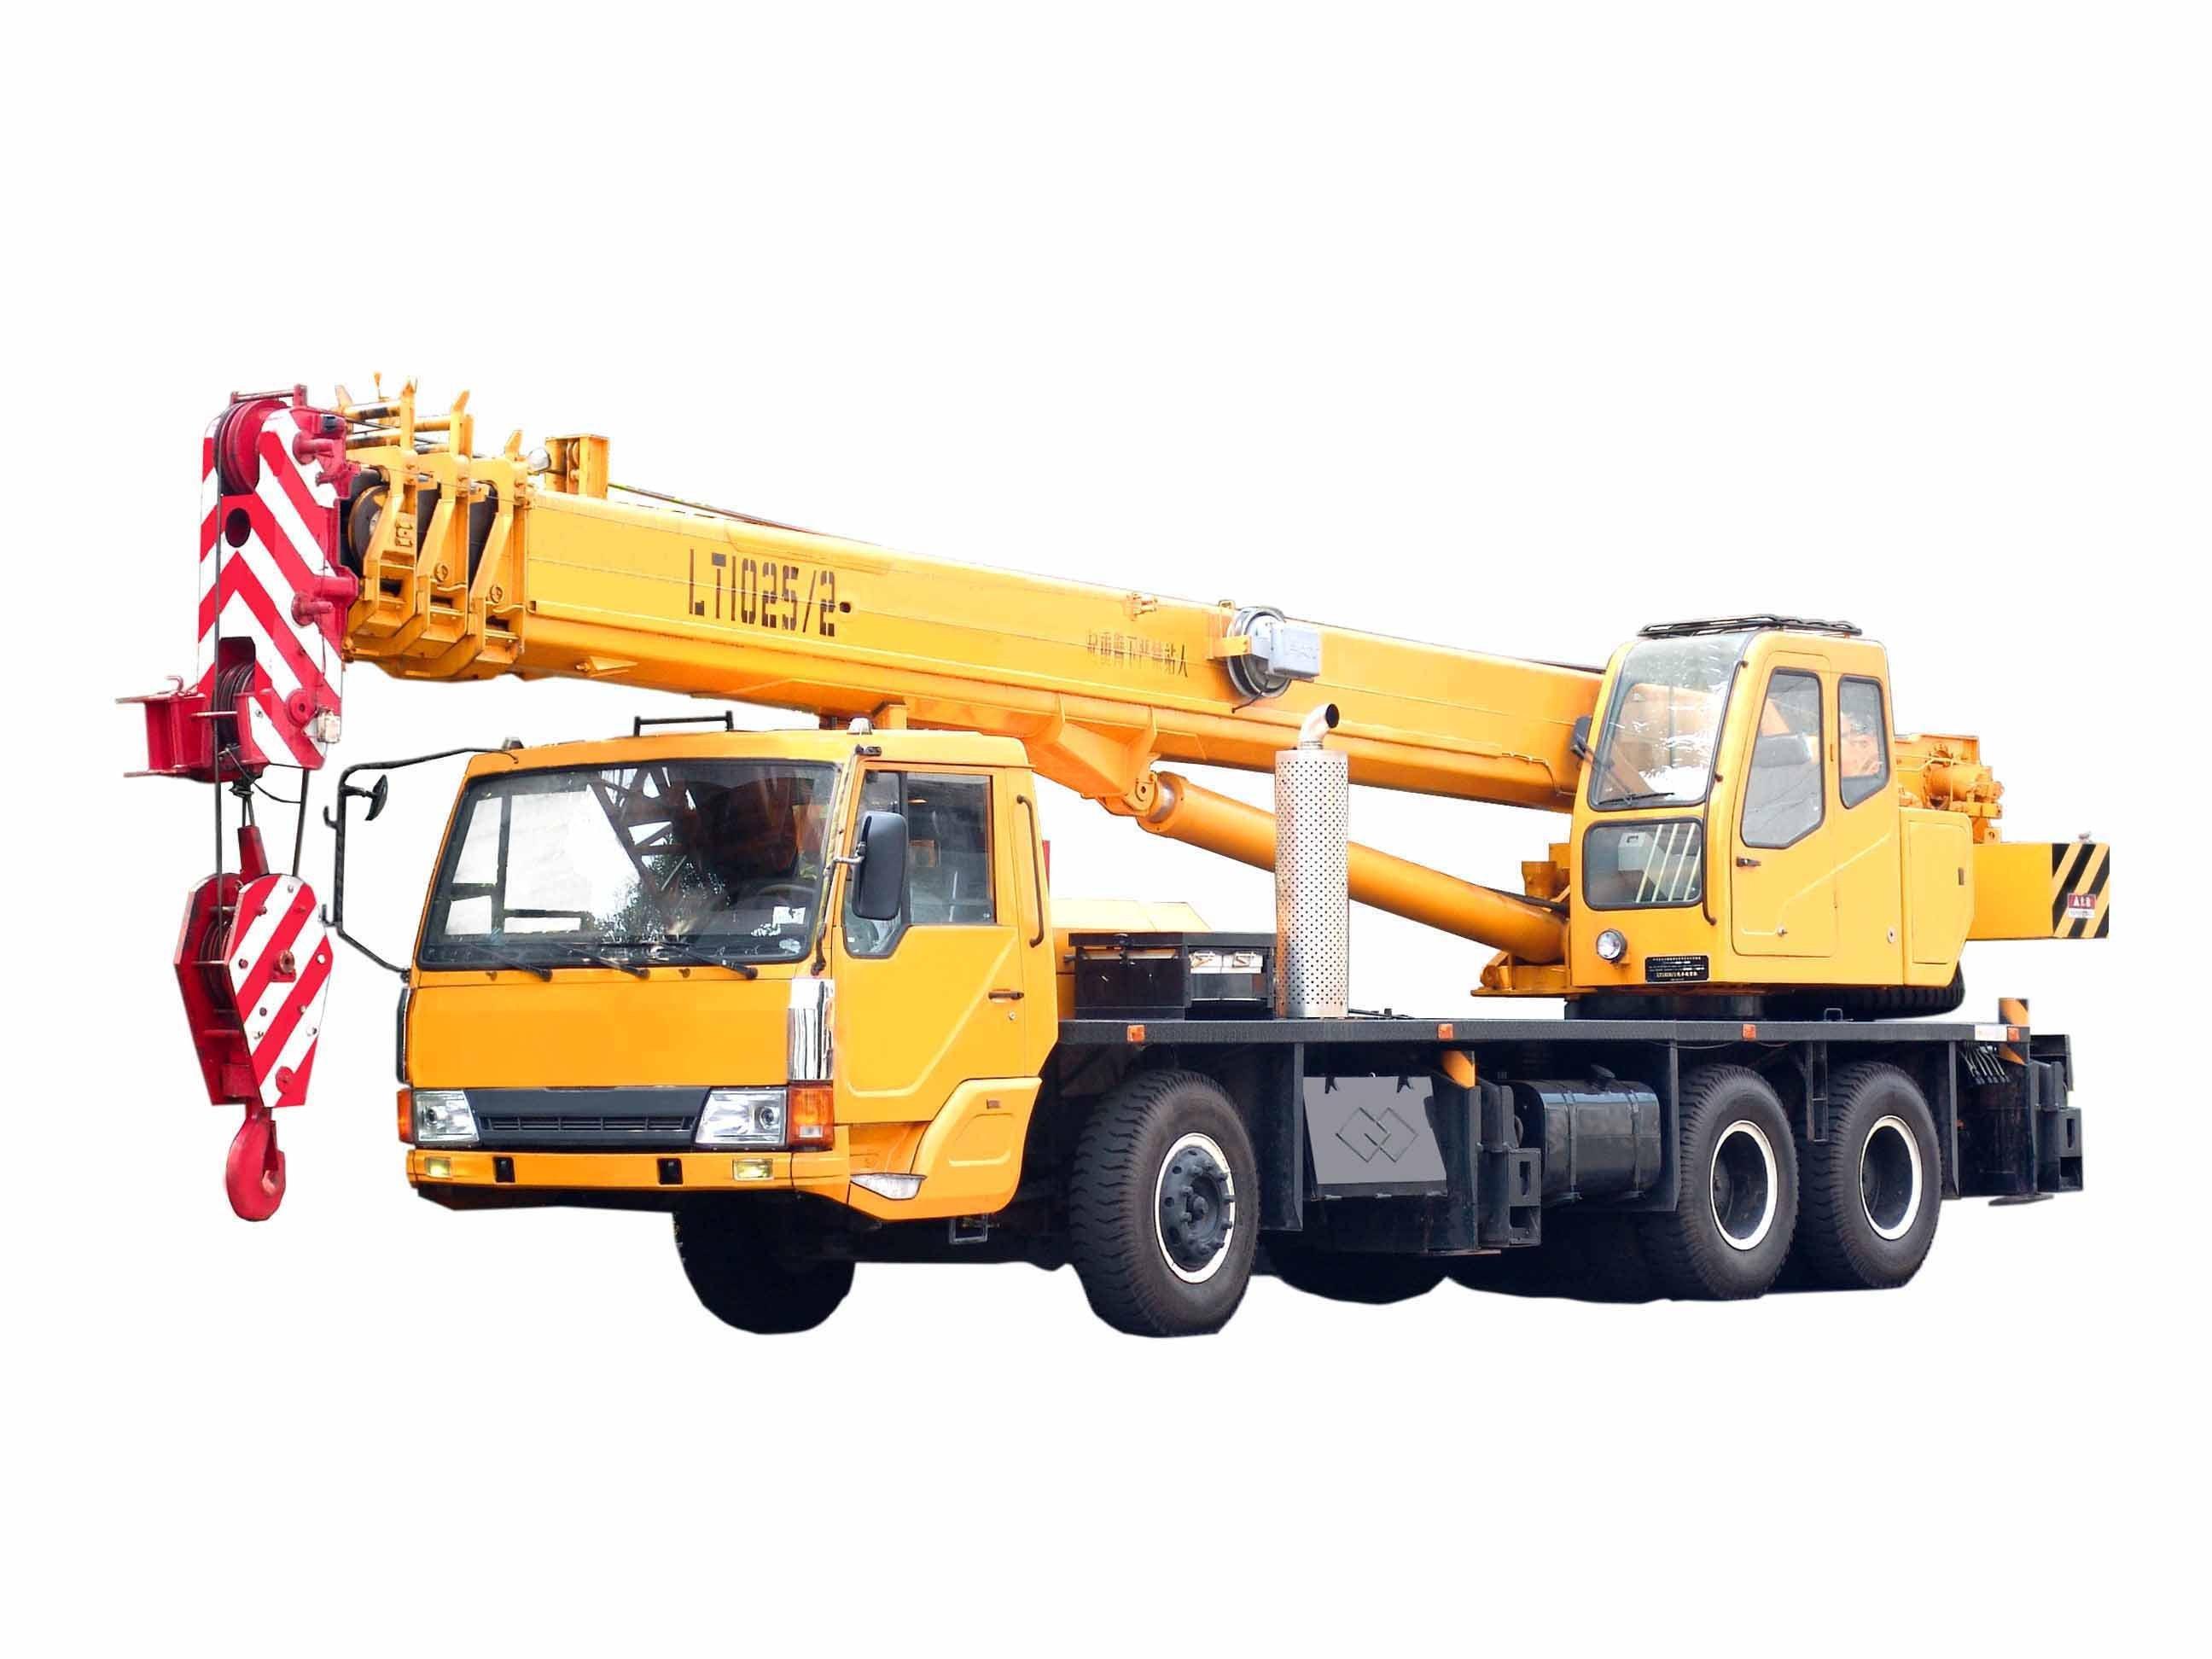 Mobile Crane Pictures : Mobile crane construction truck semi tractor ariel cranes